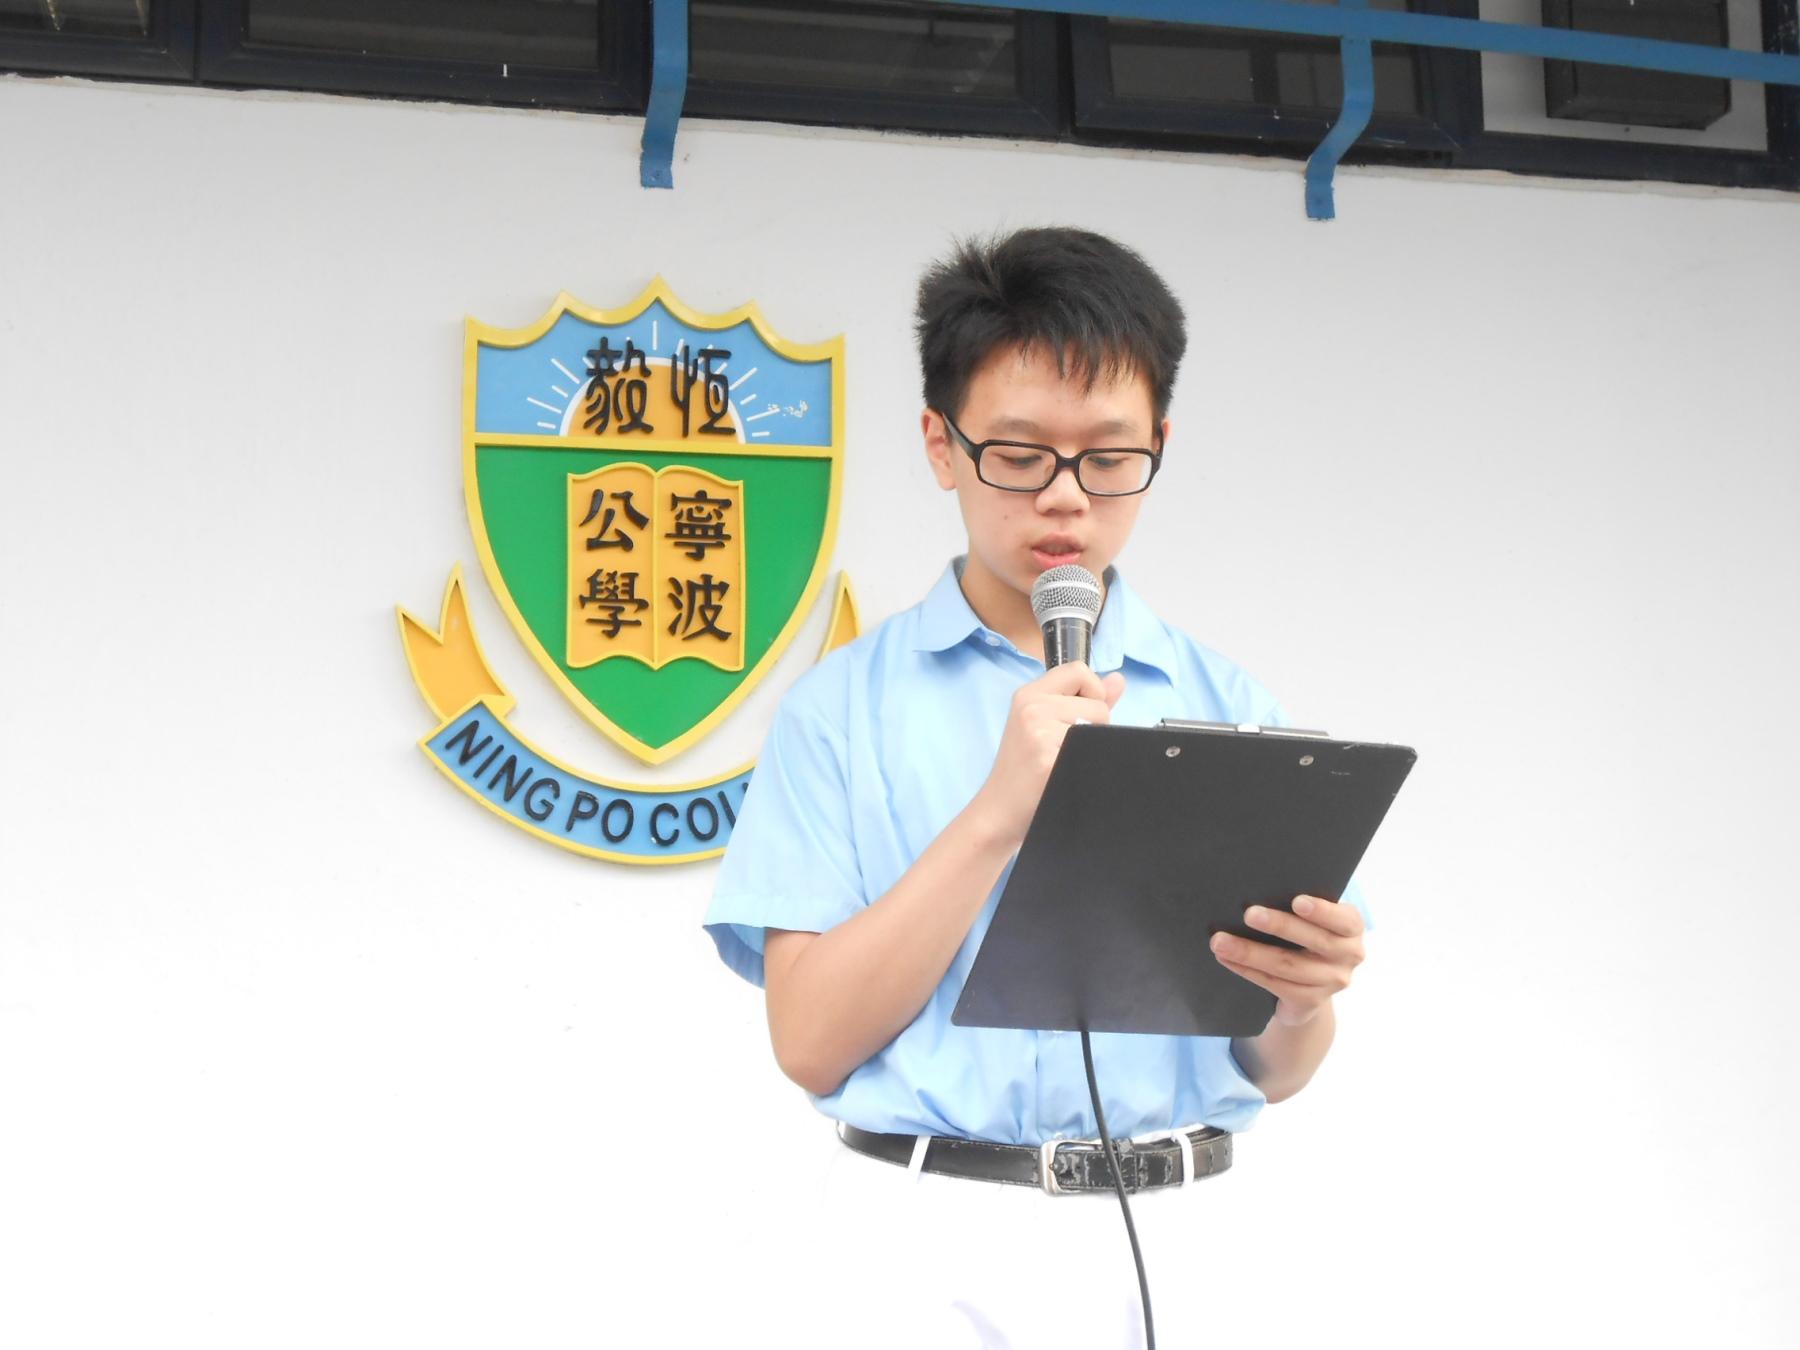 http://npc.edu.hk/sites/default/files/dscn9563.jpg